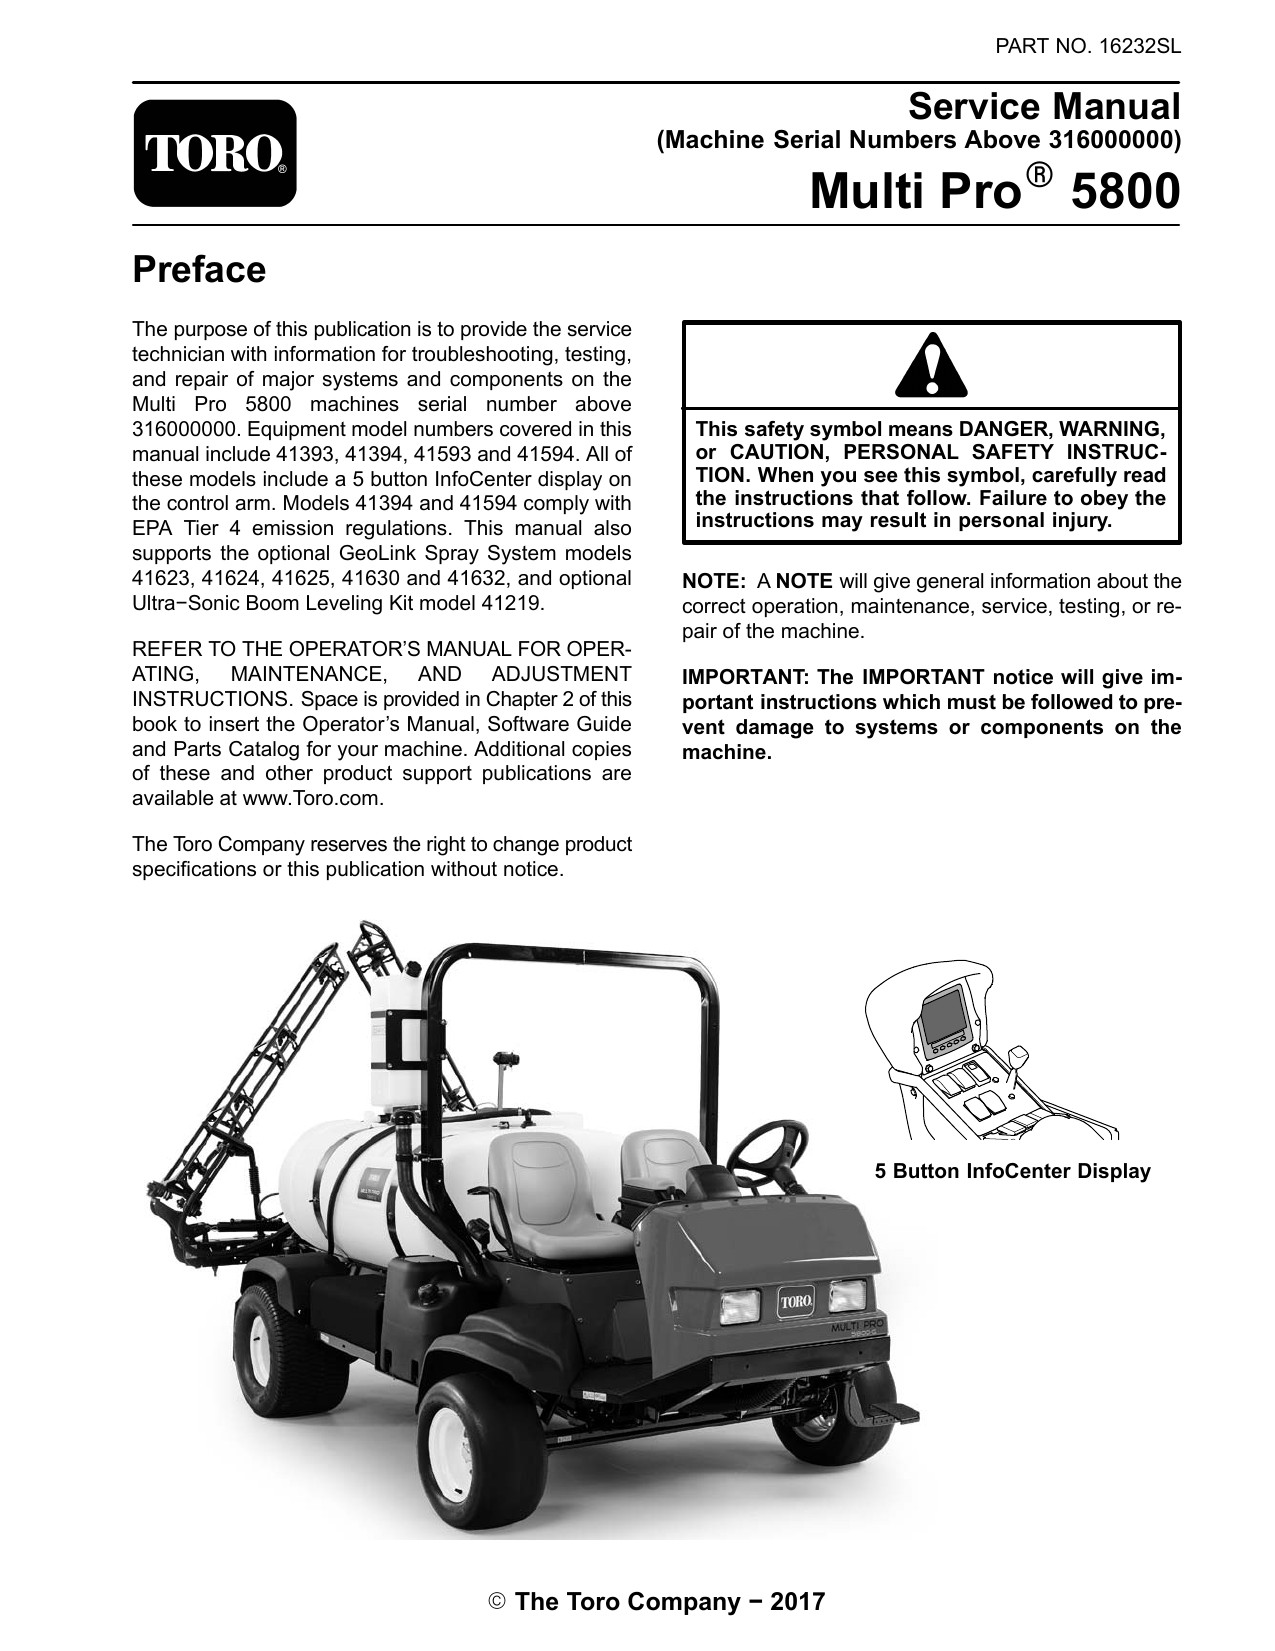 How to Tese forward Reverse Switch Club Car Cart Multi Pro 5800 Of How to Tese forward Reverse Switch Club Car Cart